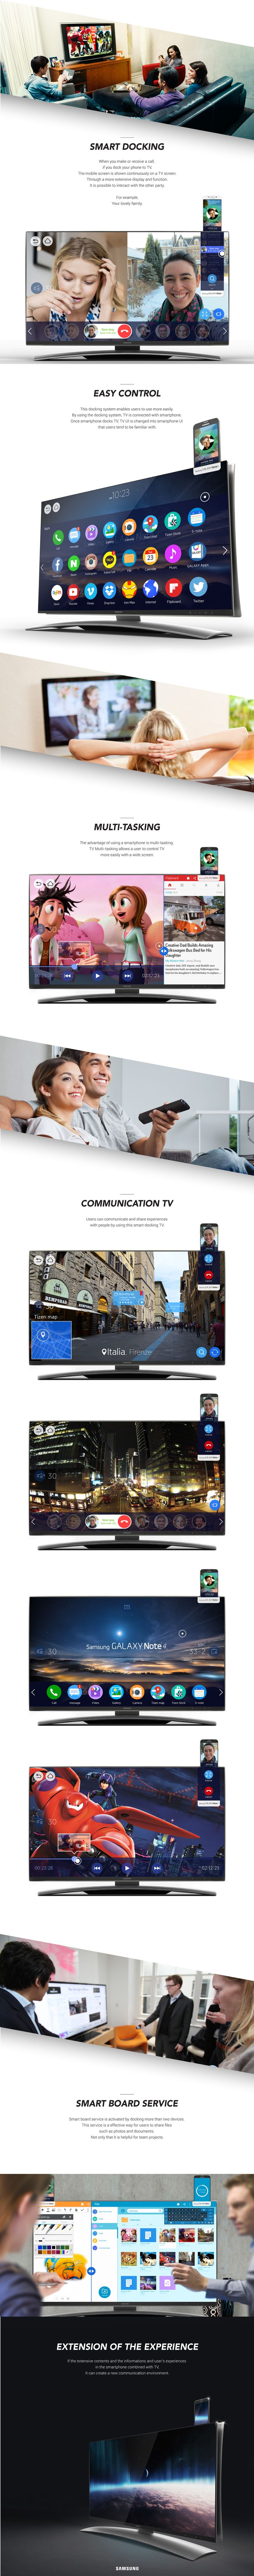 Smart Docking TV on Behance